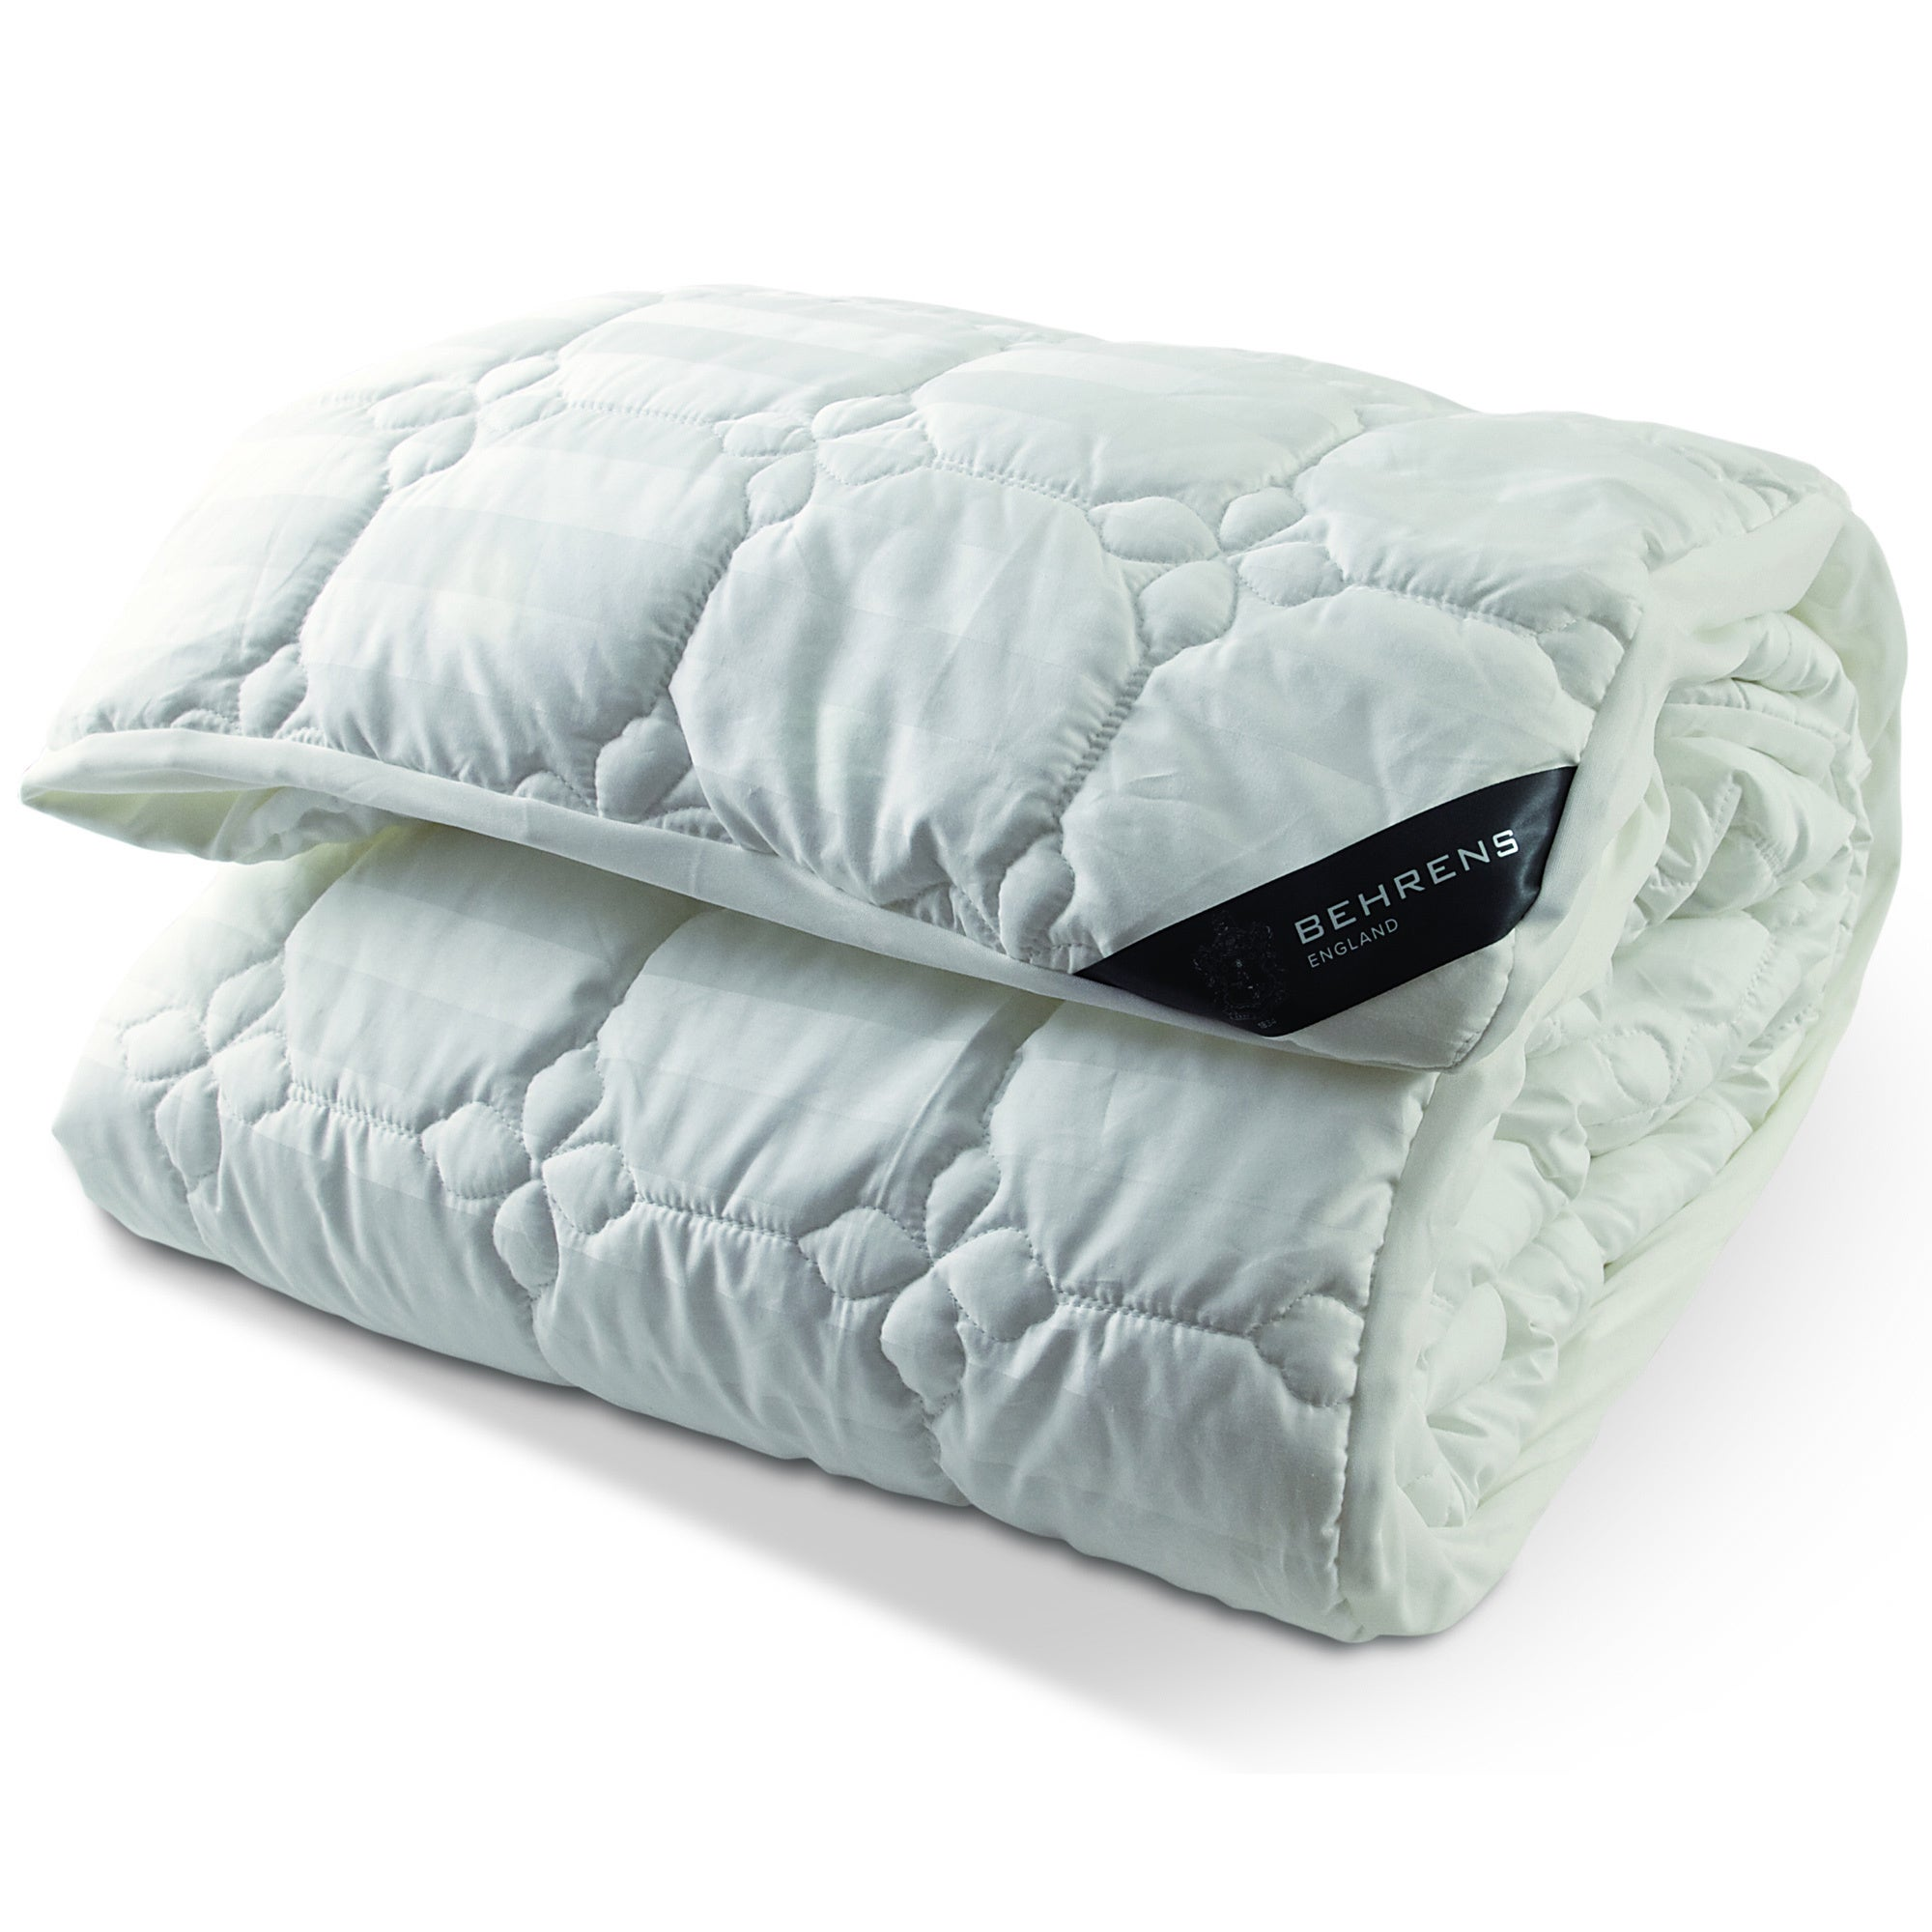 with premium protector mattress topper inch memory pin foam gel lucid cover waterproof